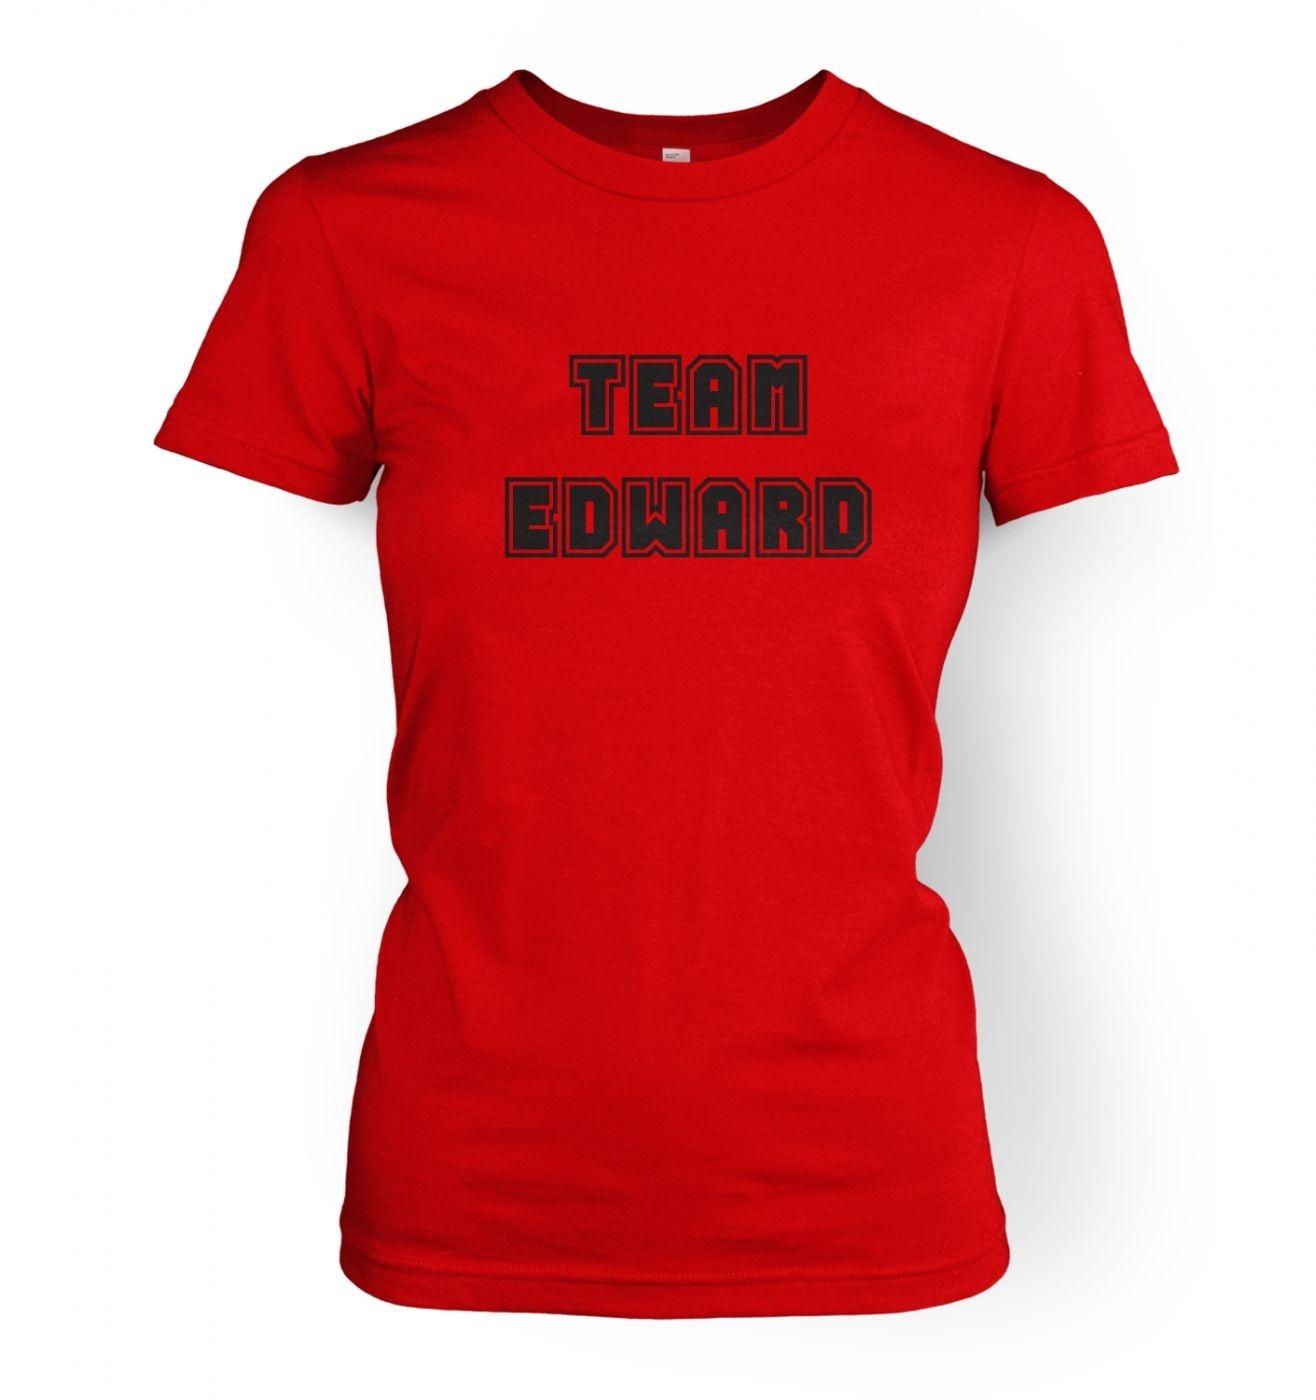 Varsity Style Team Edward Women's t-shirt - Inspired by Twilight